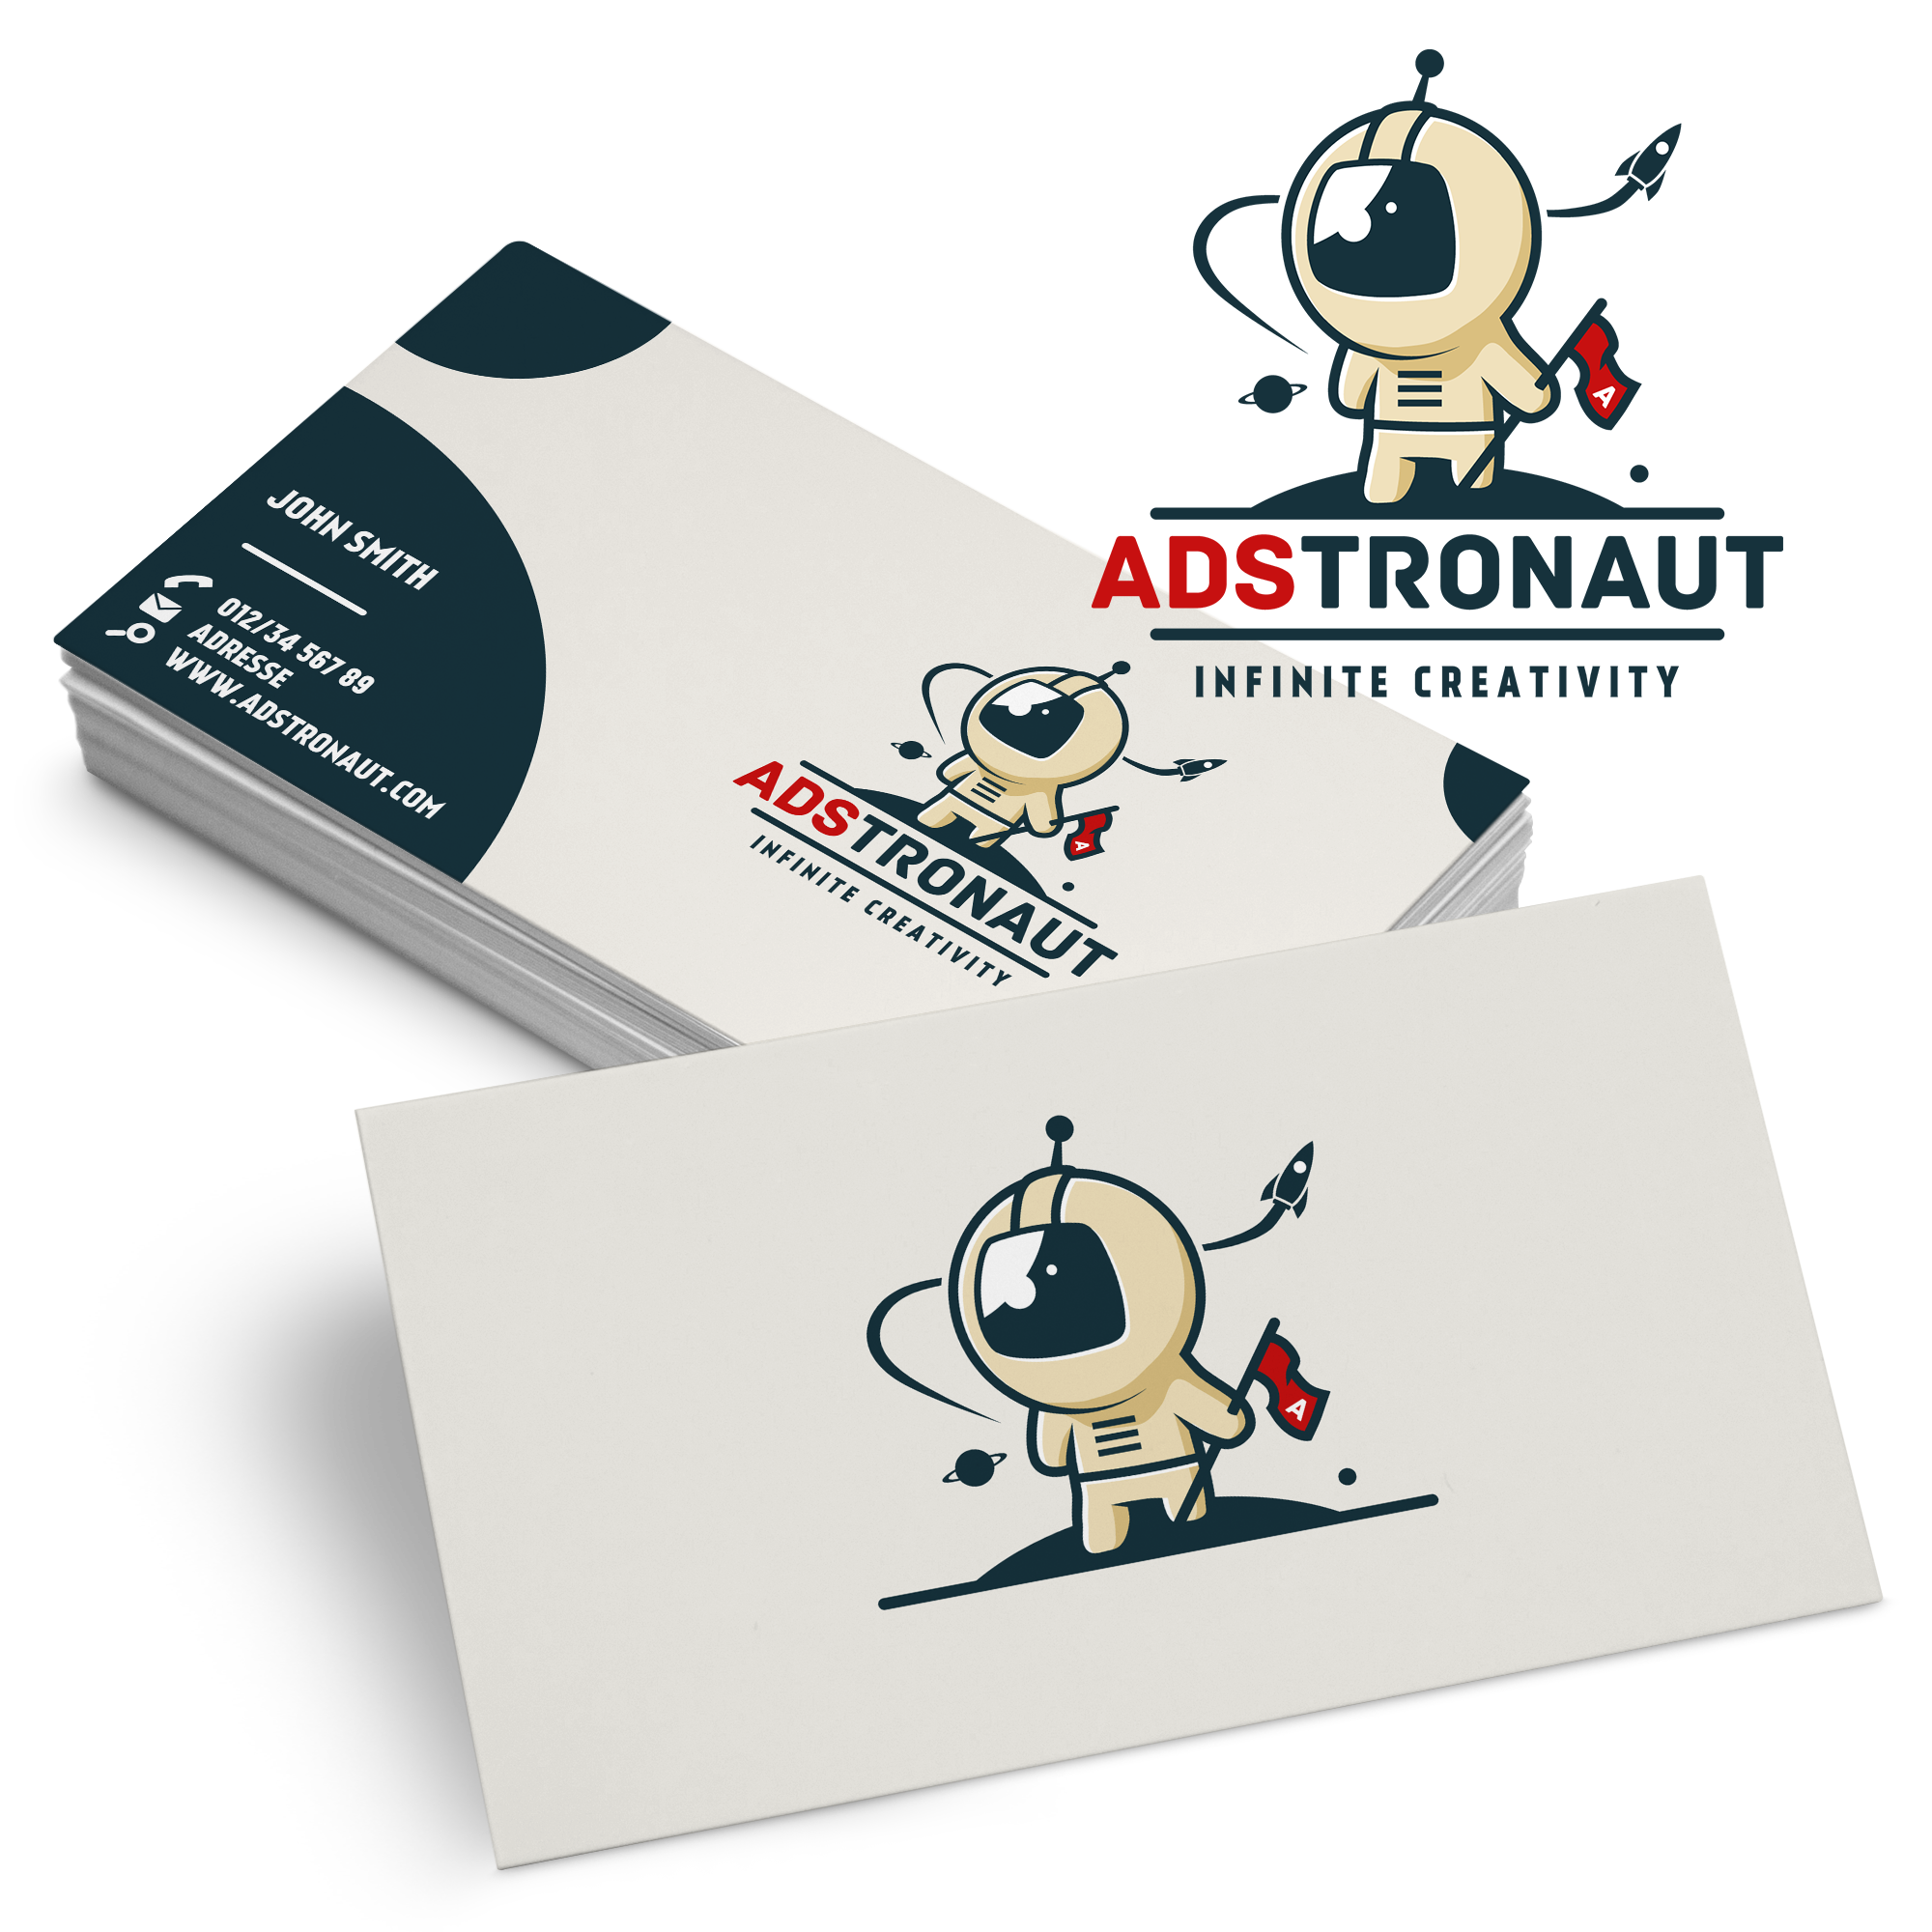 business card logos get a custom logo for business cards 99designs. Black Bedroom Furniture Sets. Home Design Ideas